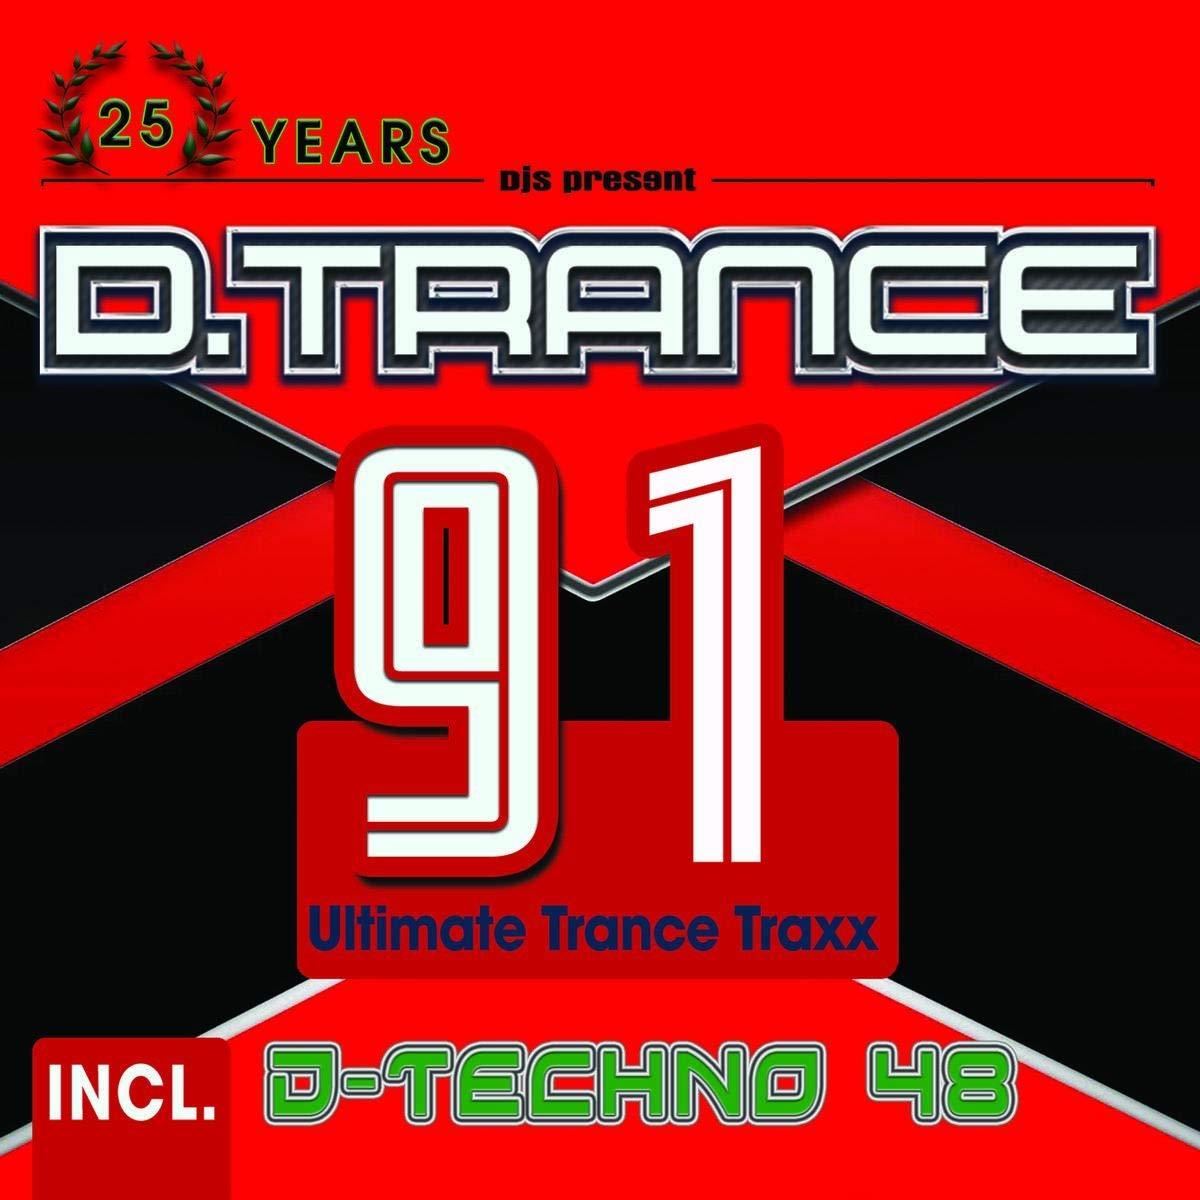 D.Trance 91